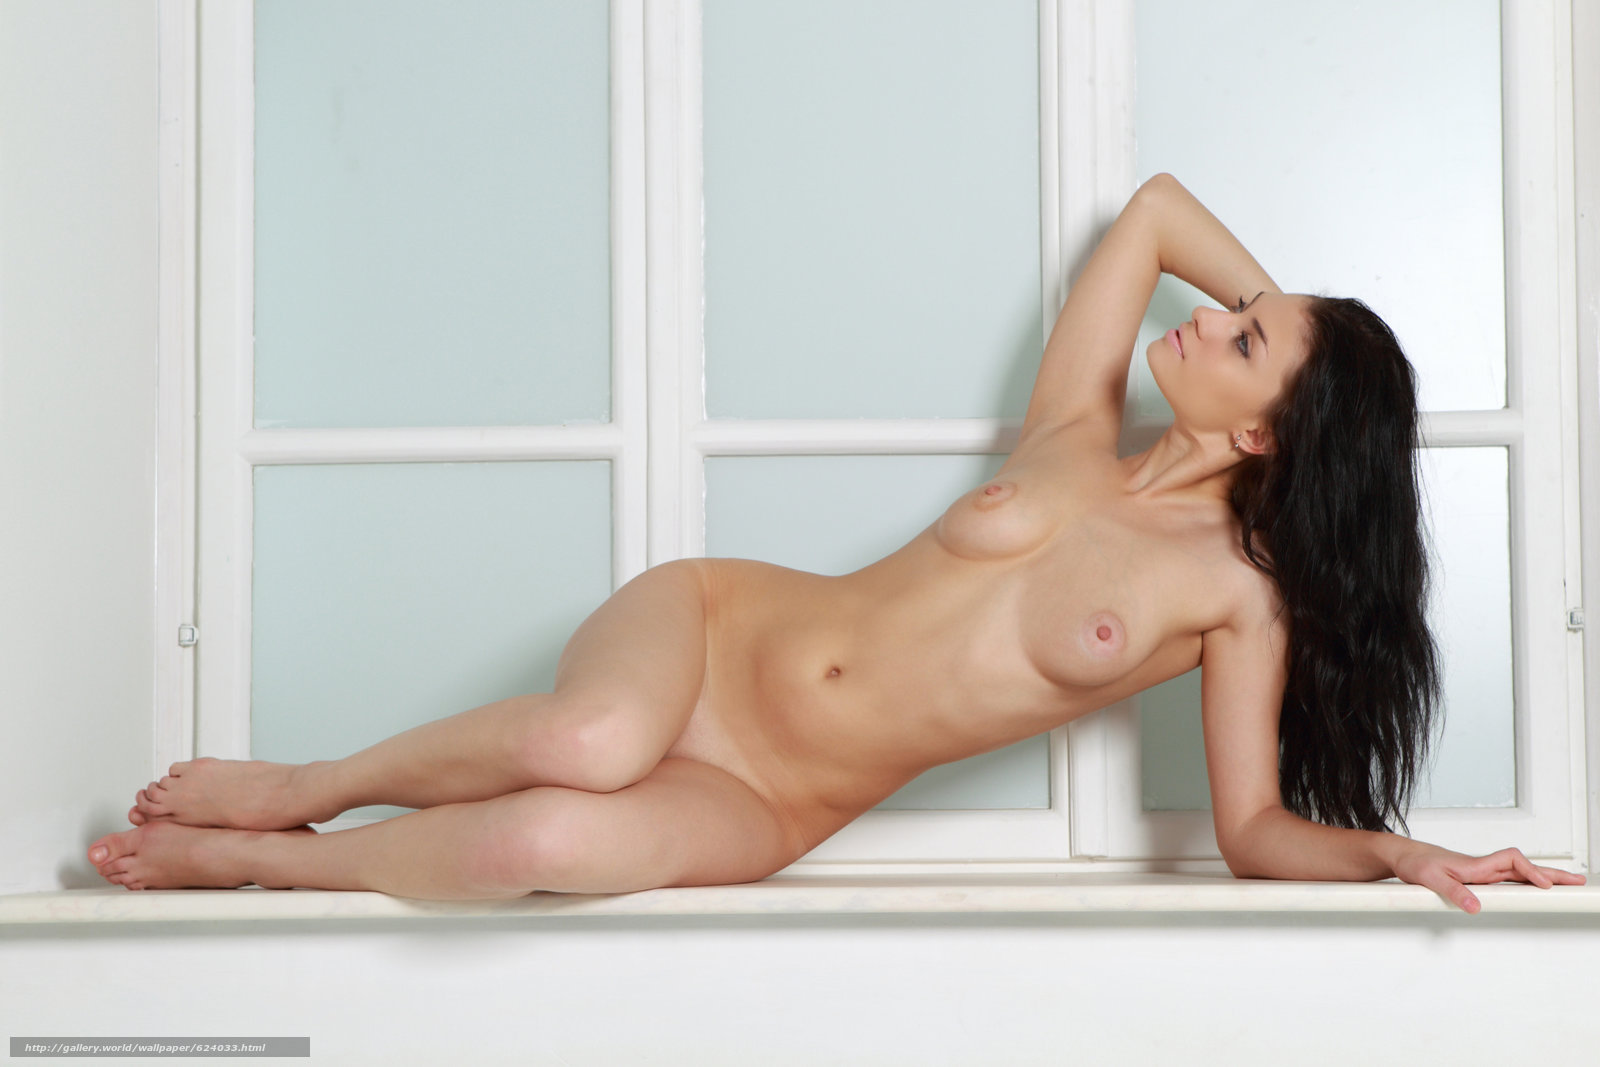 komsomolsk-na-amure-eroticheskie-magazini